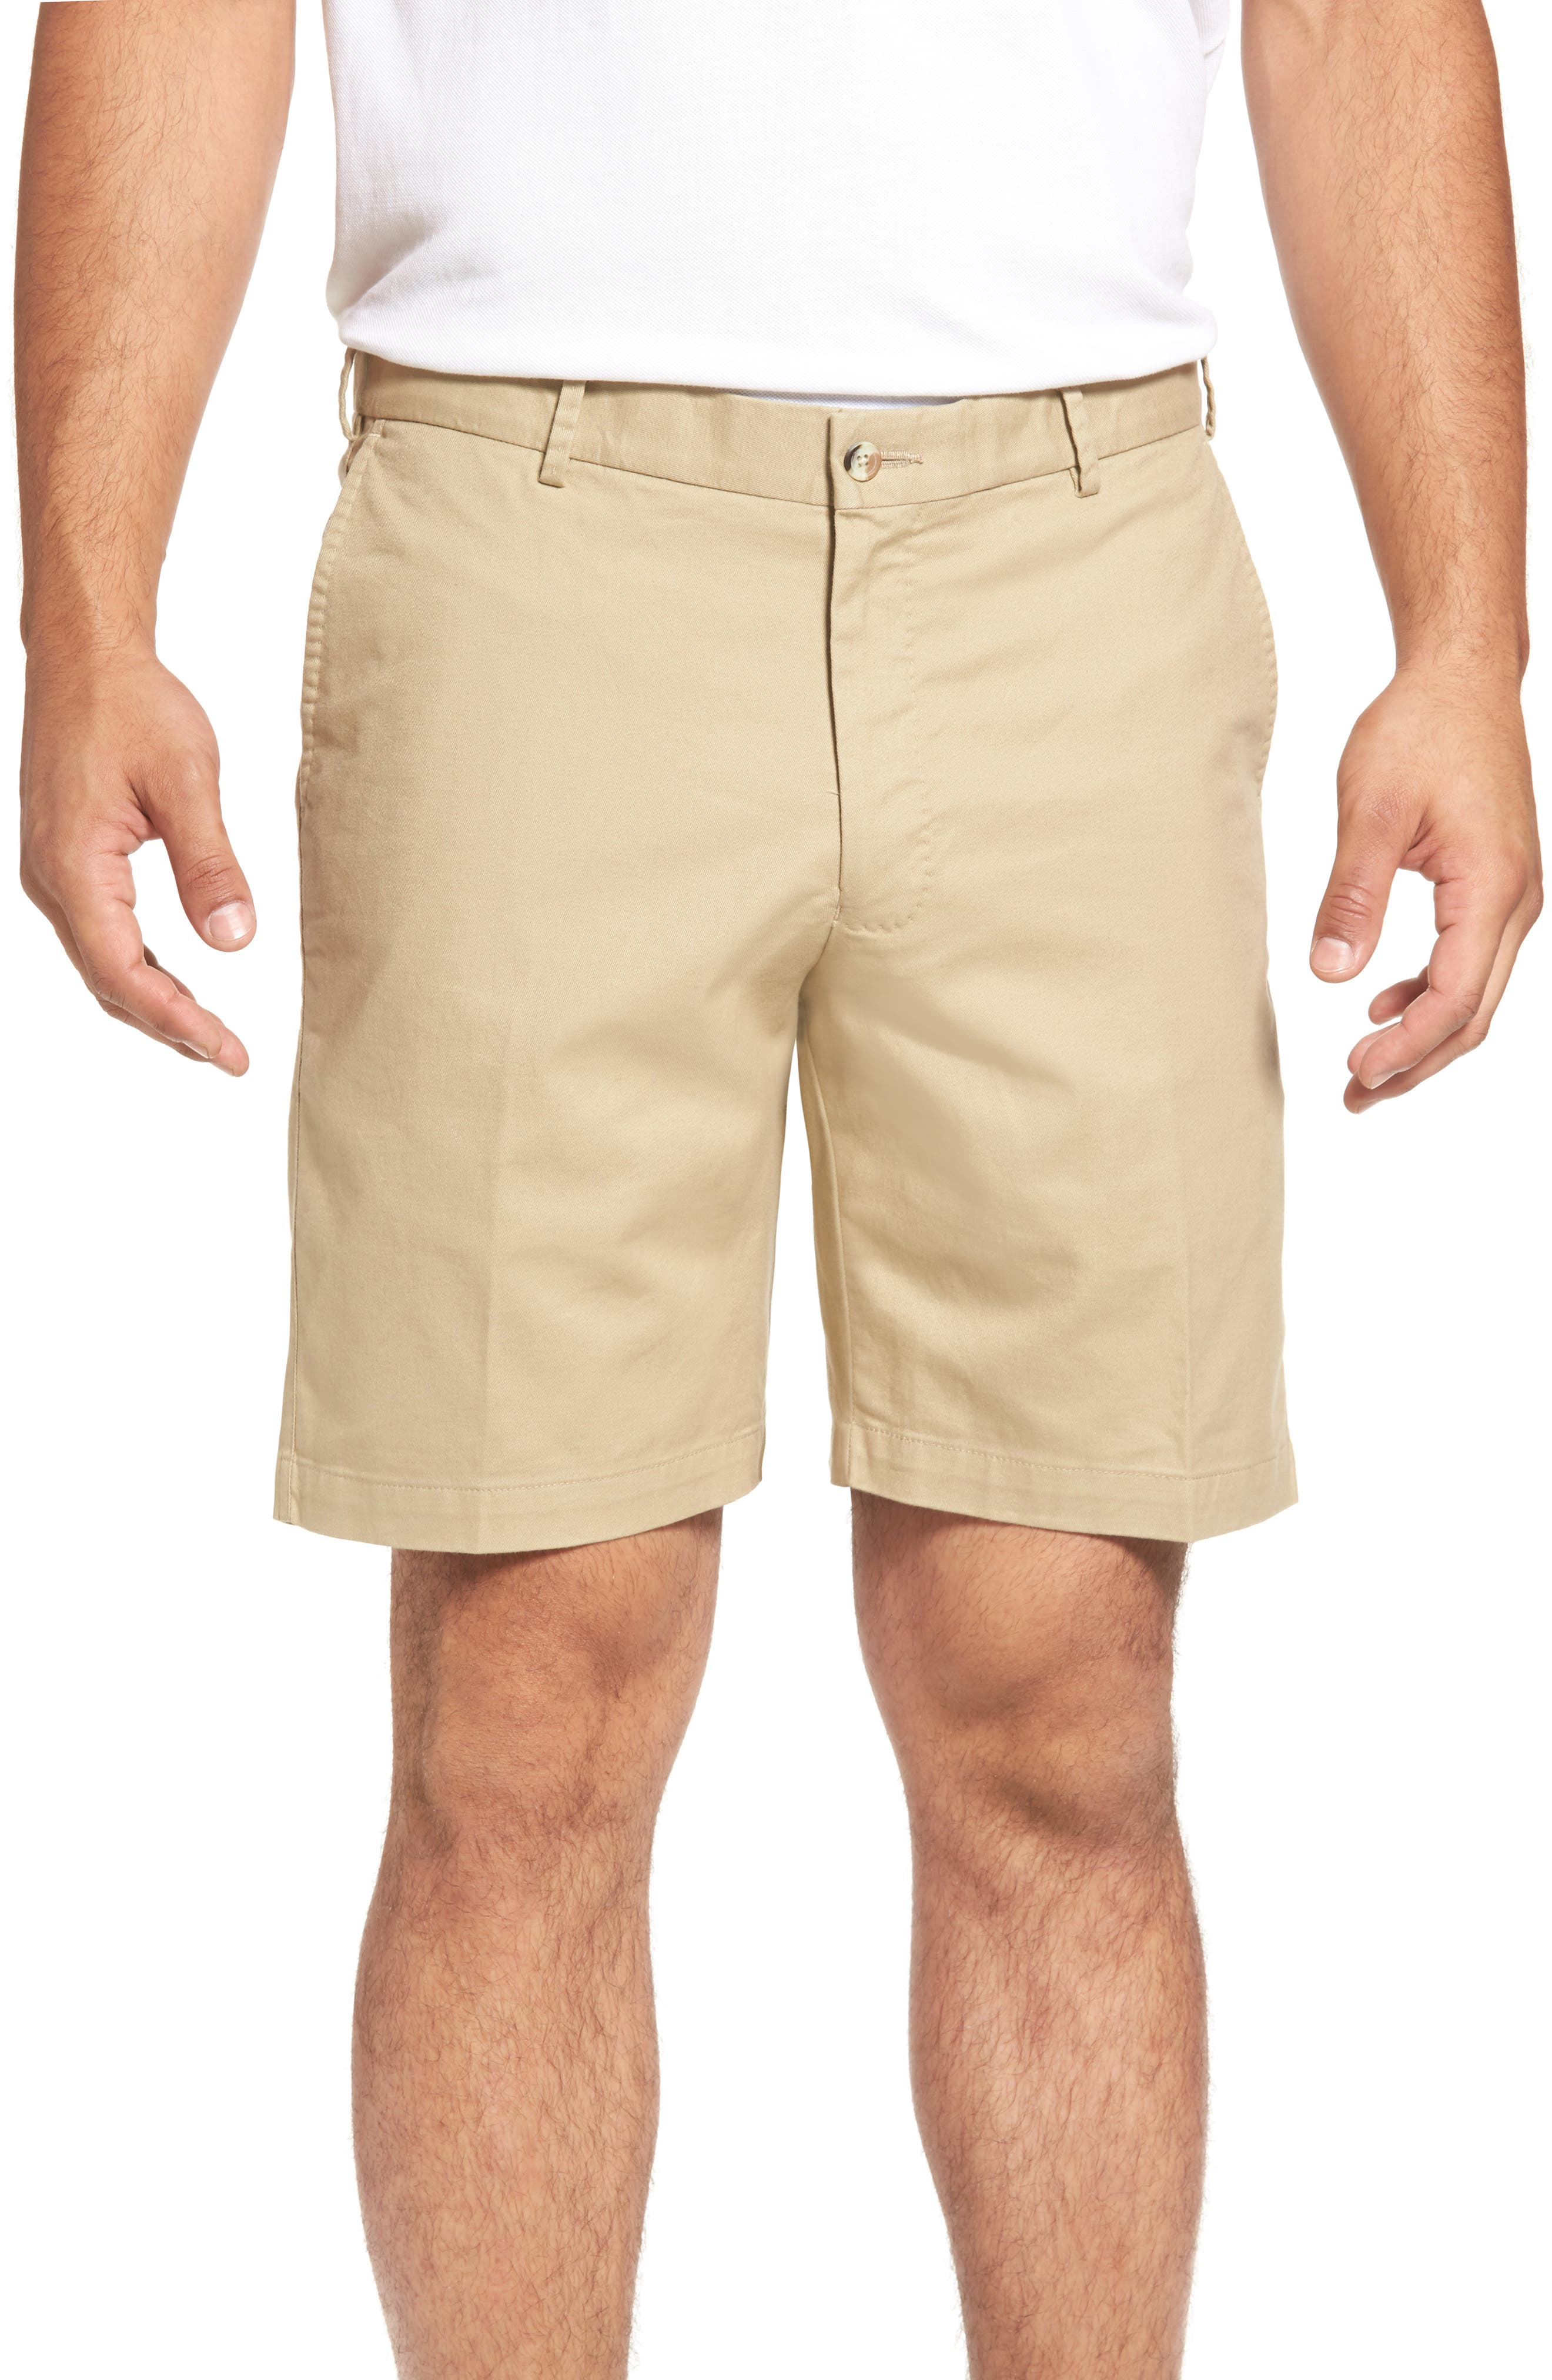 Peter Millar Soft Touch Twill Shorts (Tall)